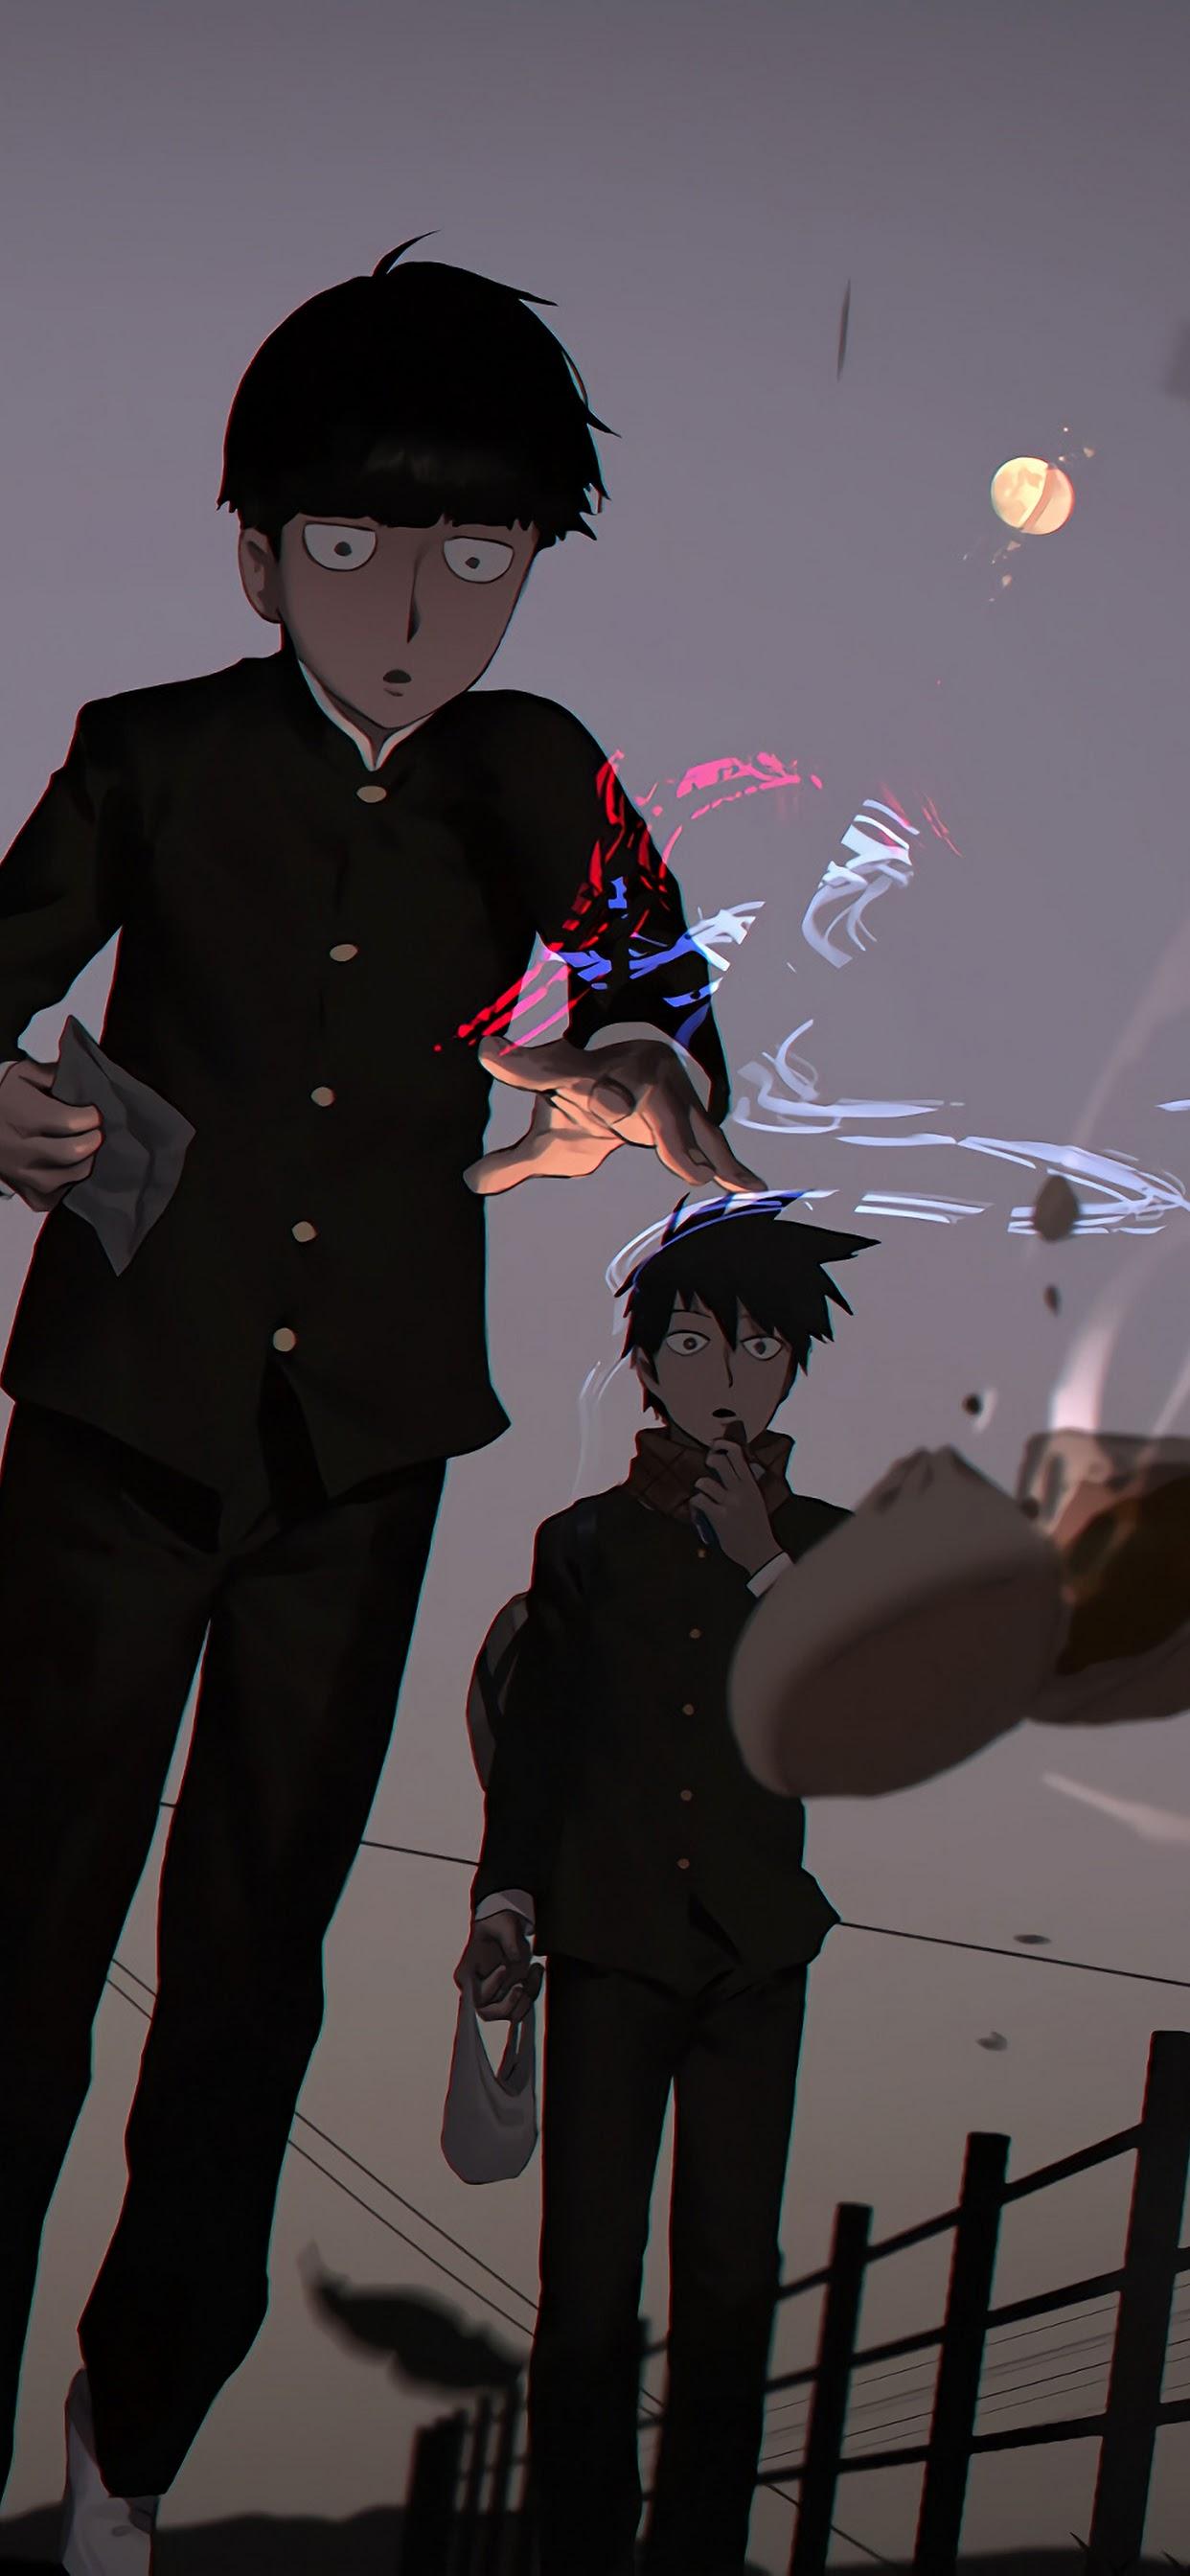 mob psycho 100 anime characters 4k wallpaper 16 mob psycho 100 anime characters 4k